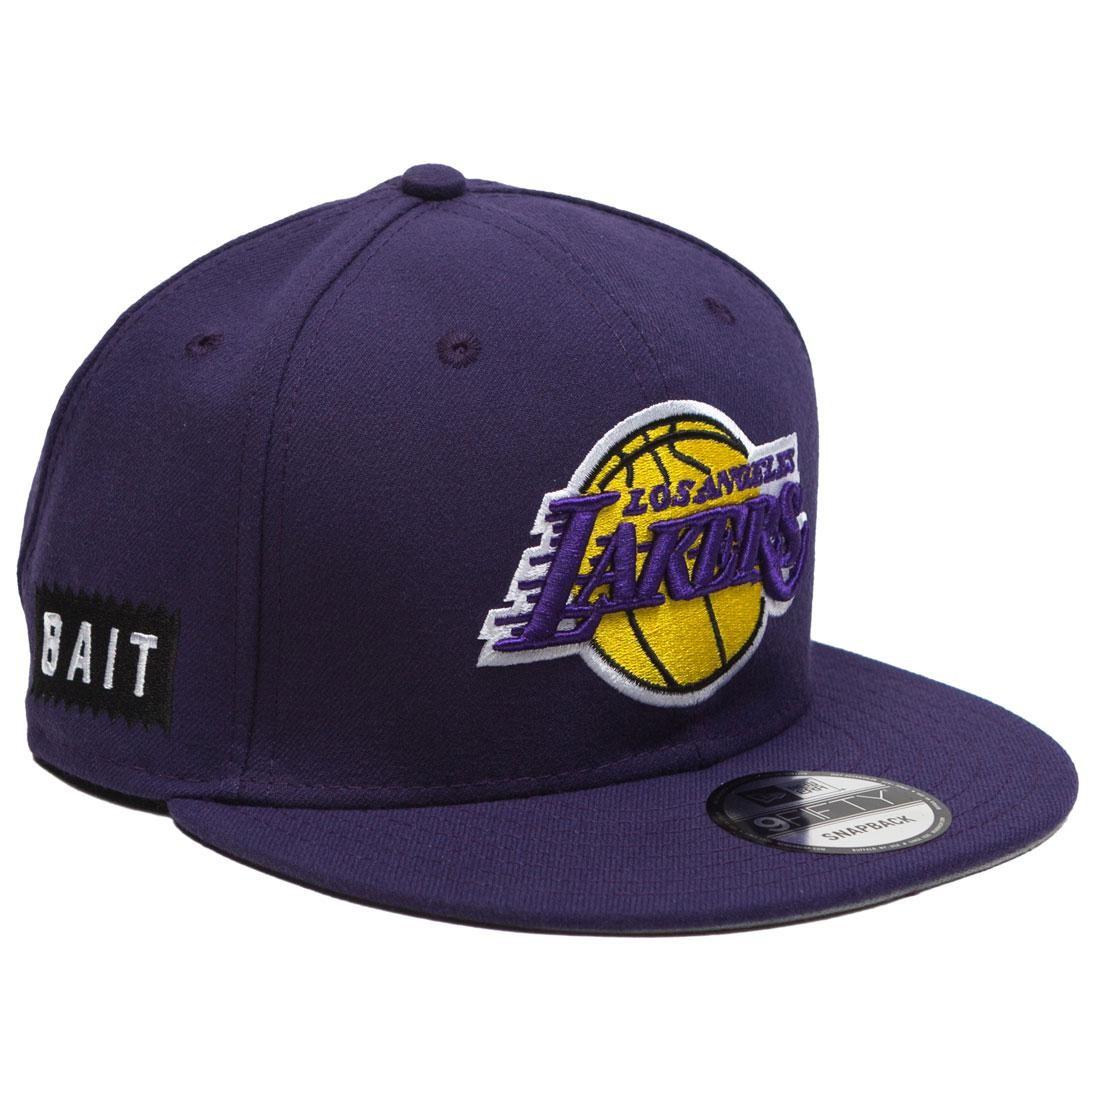 37e8eea41fd565 BAIT x NBA X New Era 9Fifty Los Angeles Lakers OTC Snapback Cap purple